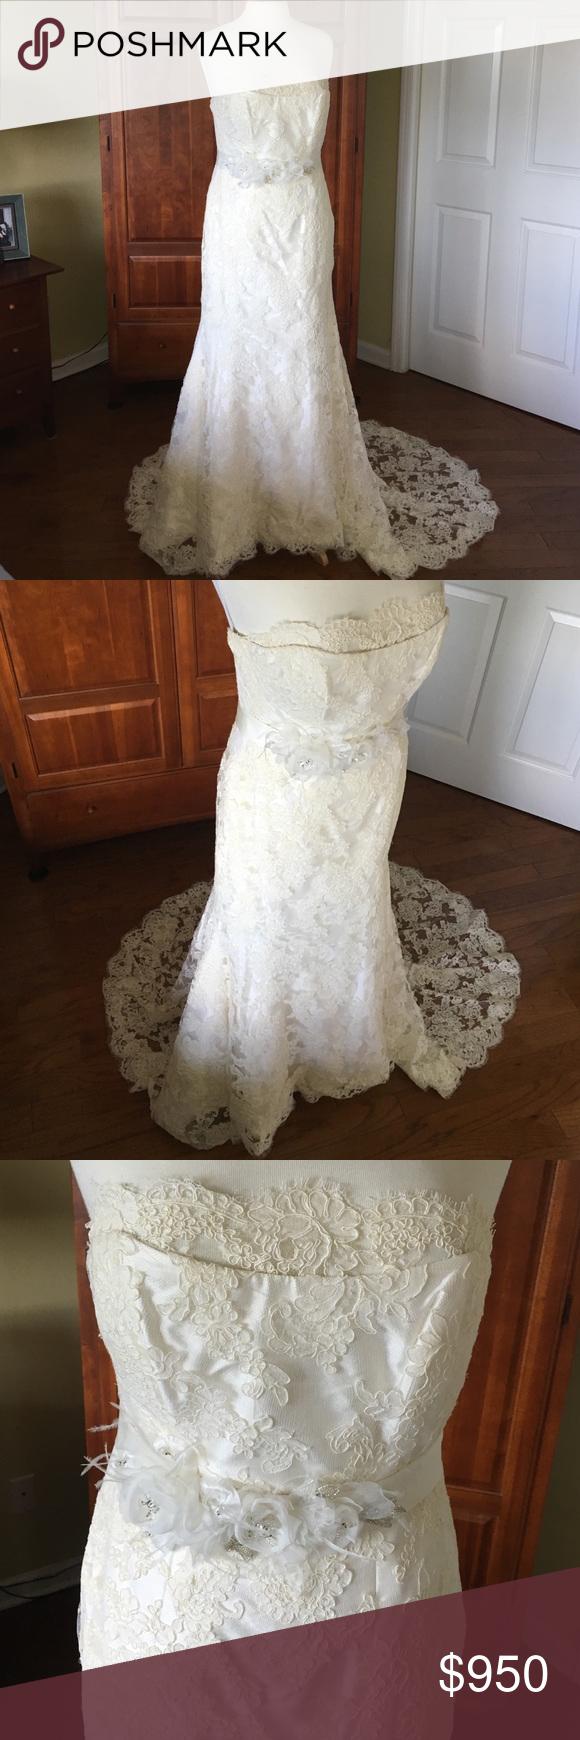 Marisa wedding dress  Bridal Marisa Wedding Gown French Alencon lace Marisa  Wedding